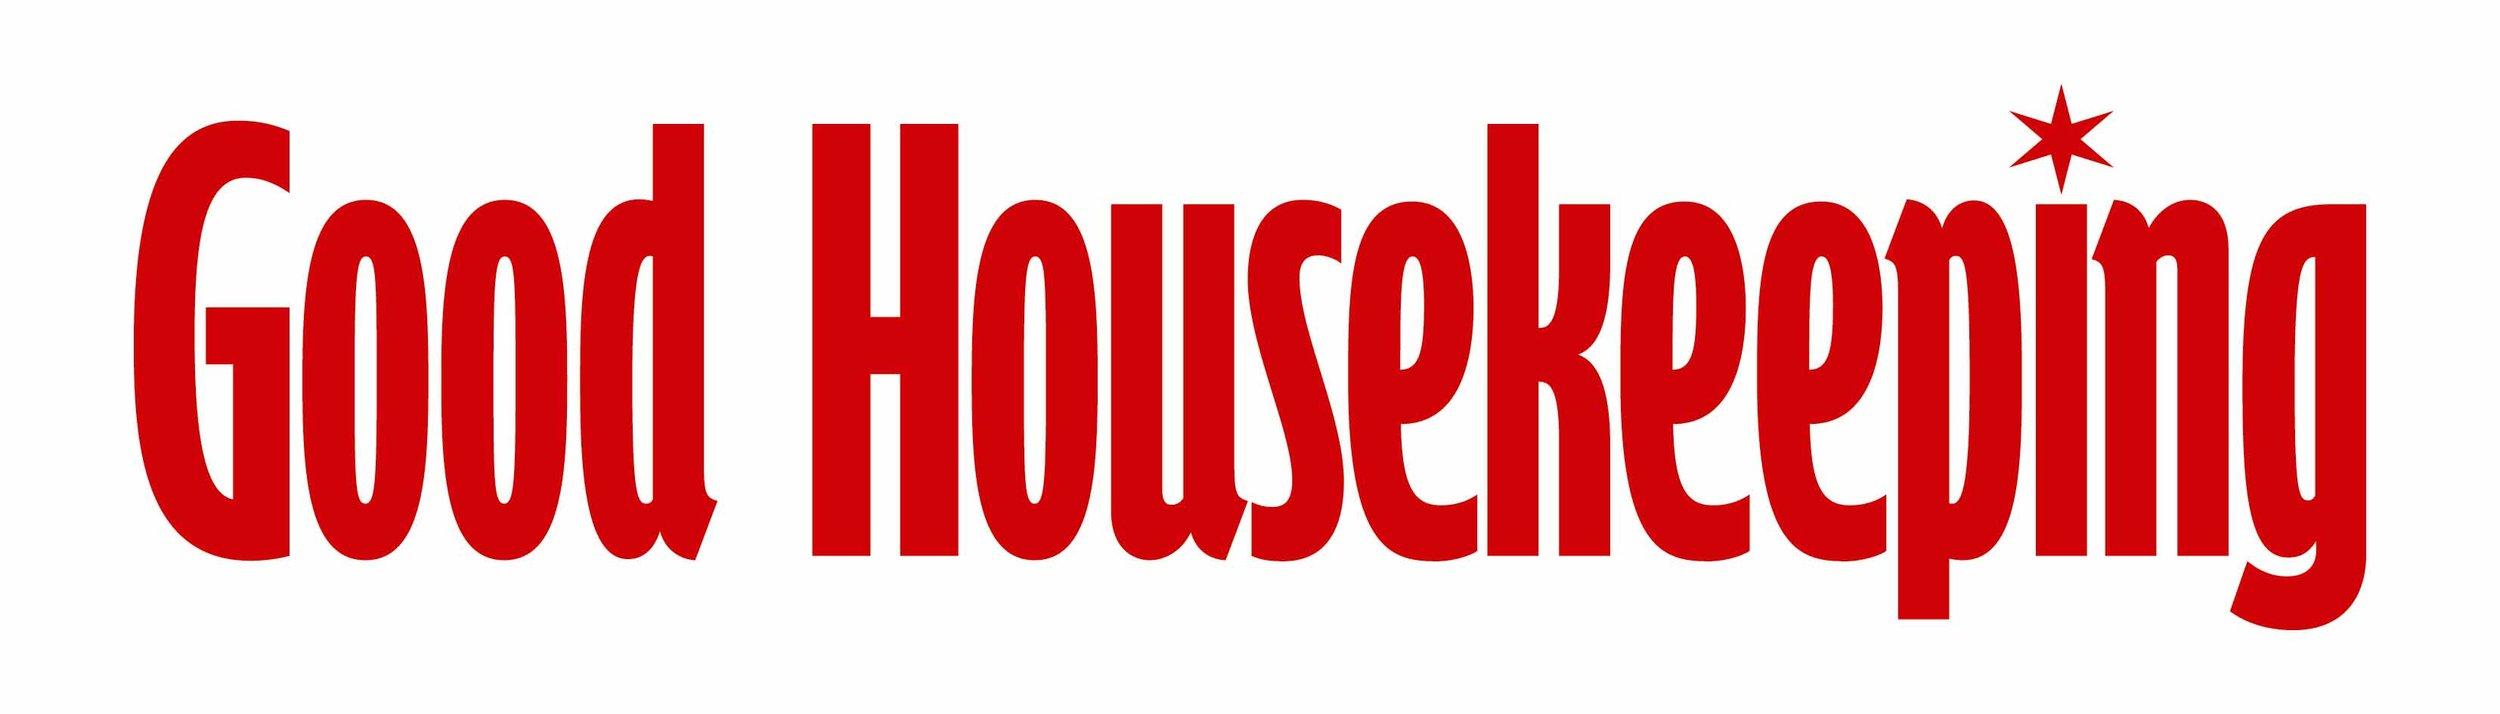 good housekeeping logo.jpg